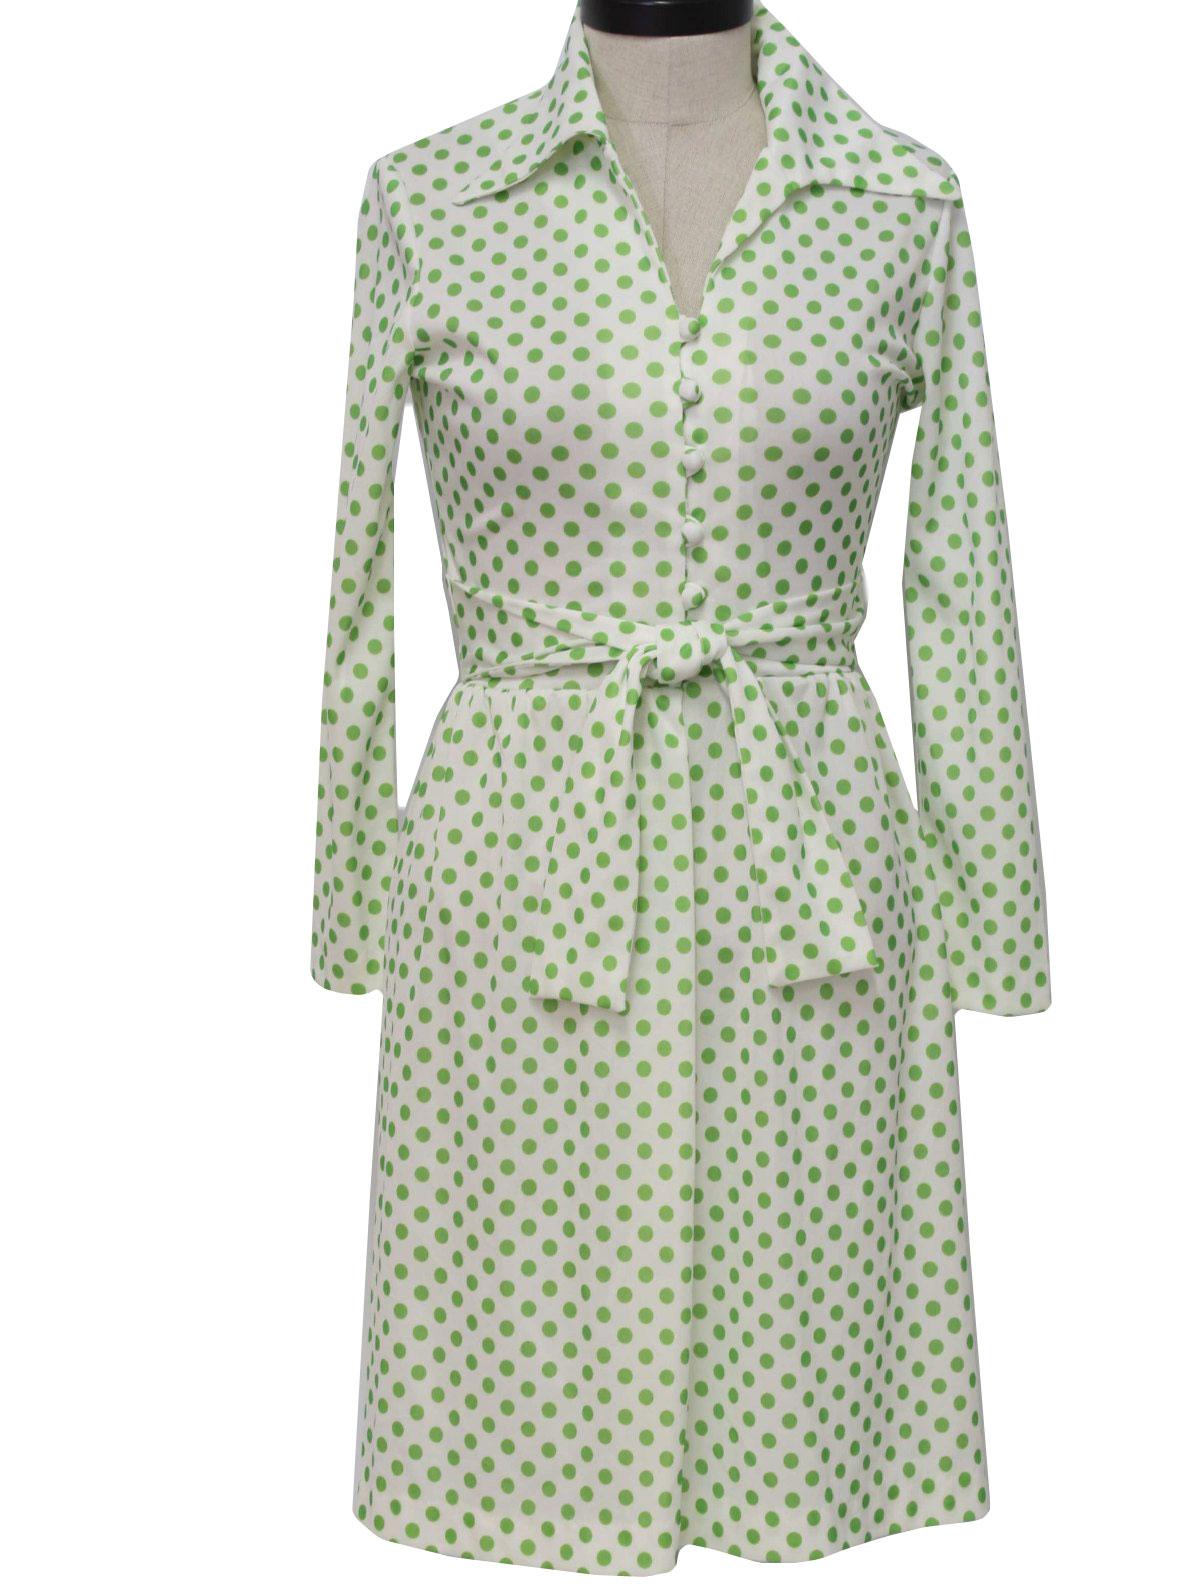 Care Label 70's Vintage Dress: 70s -Care Label- Womens ...